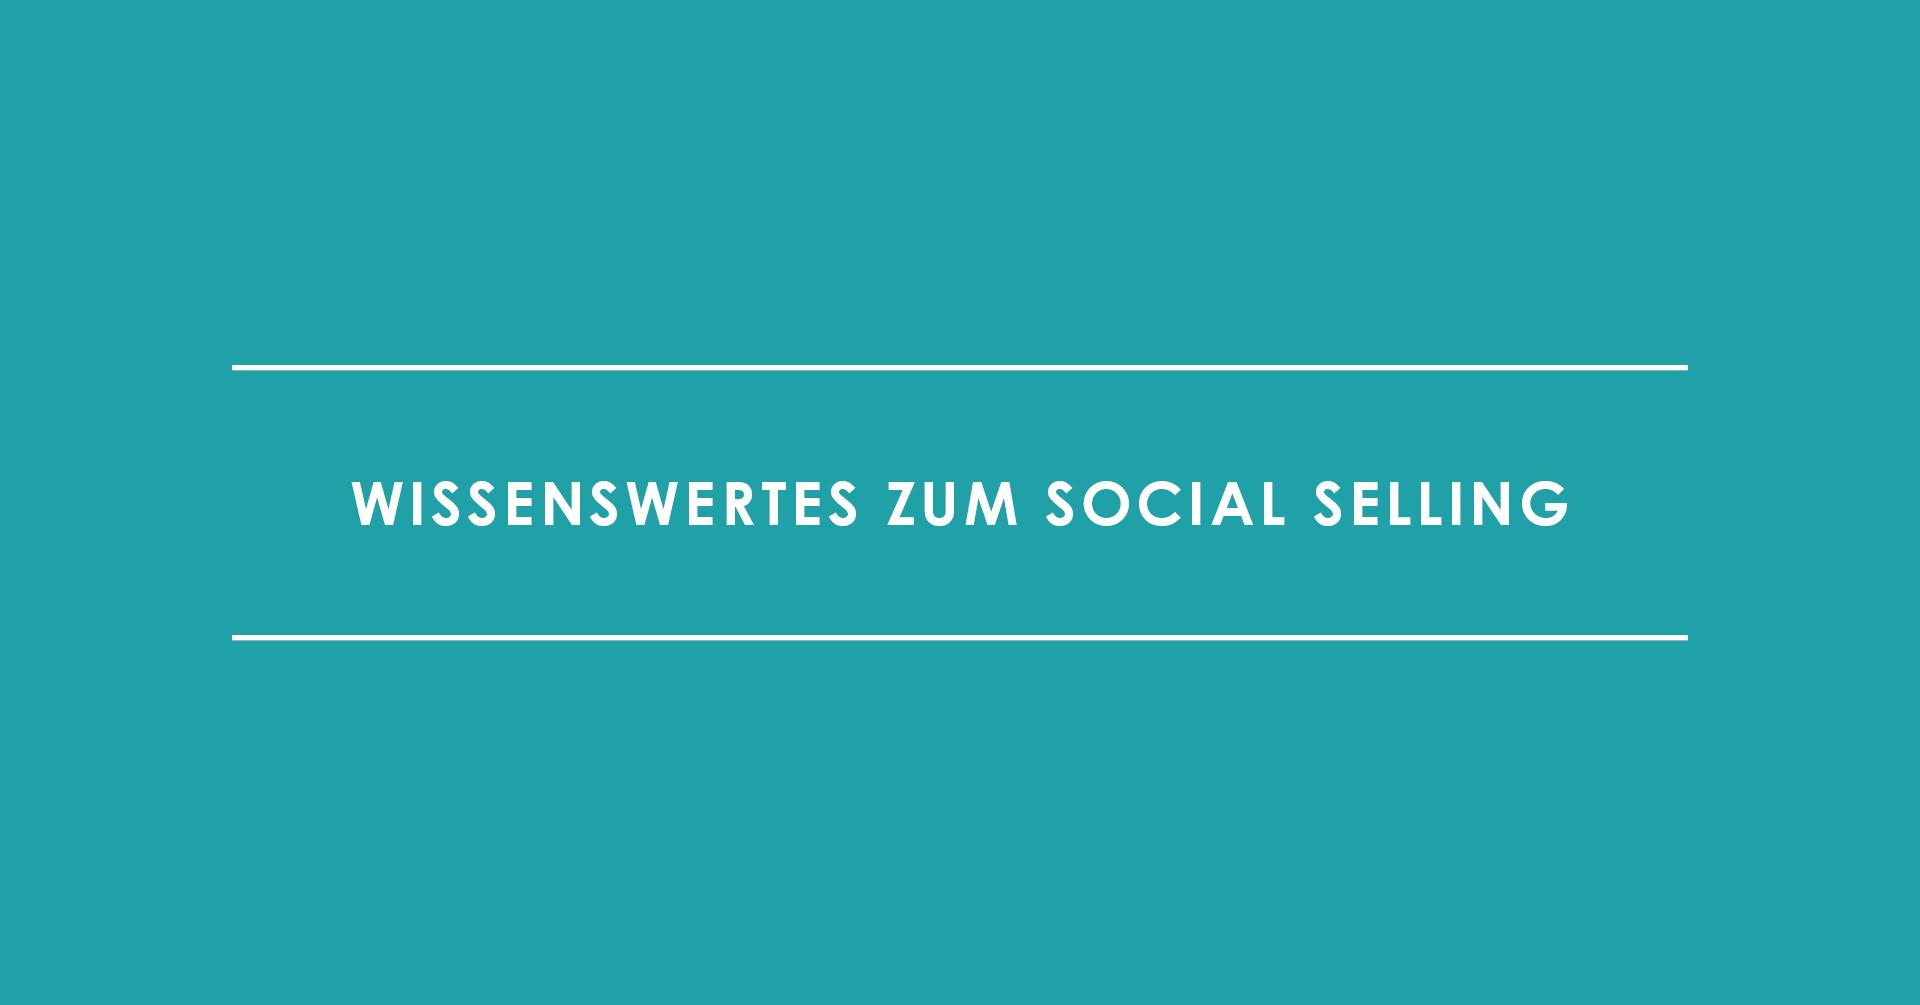 Wissenswertes zum Social Selling, TRIALTA